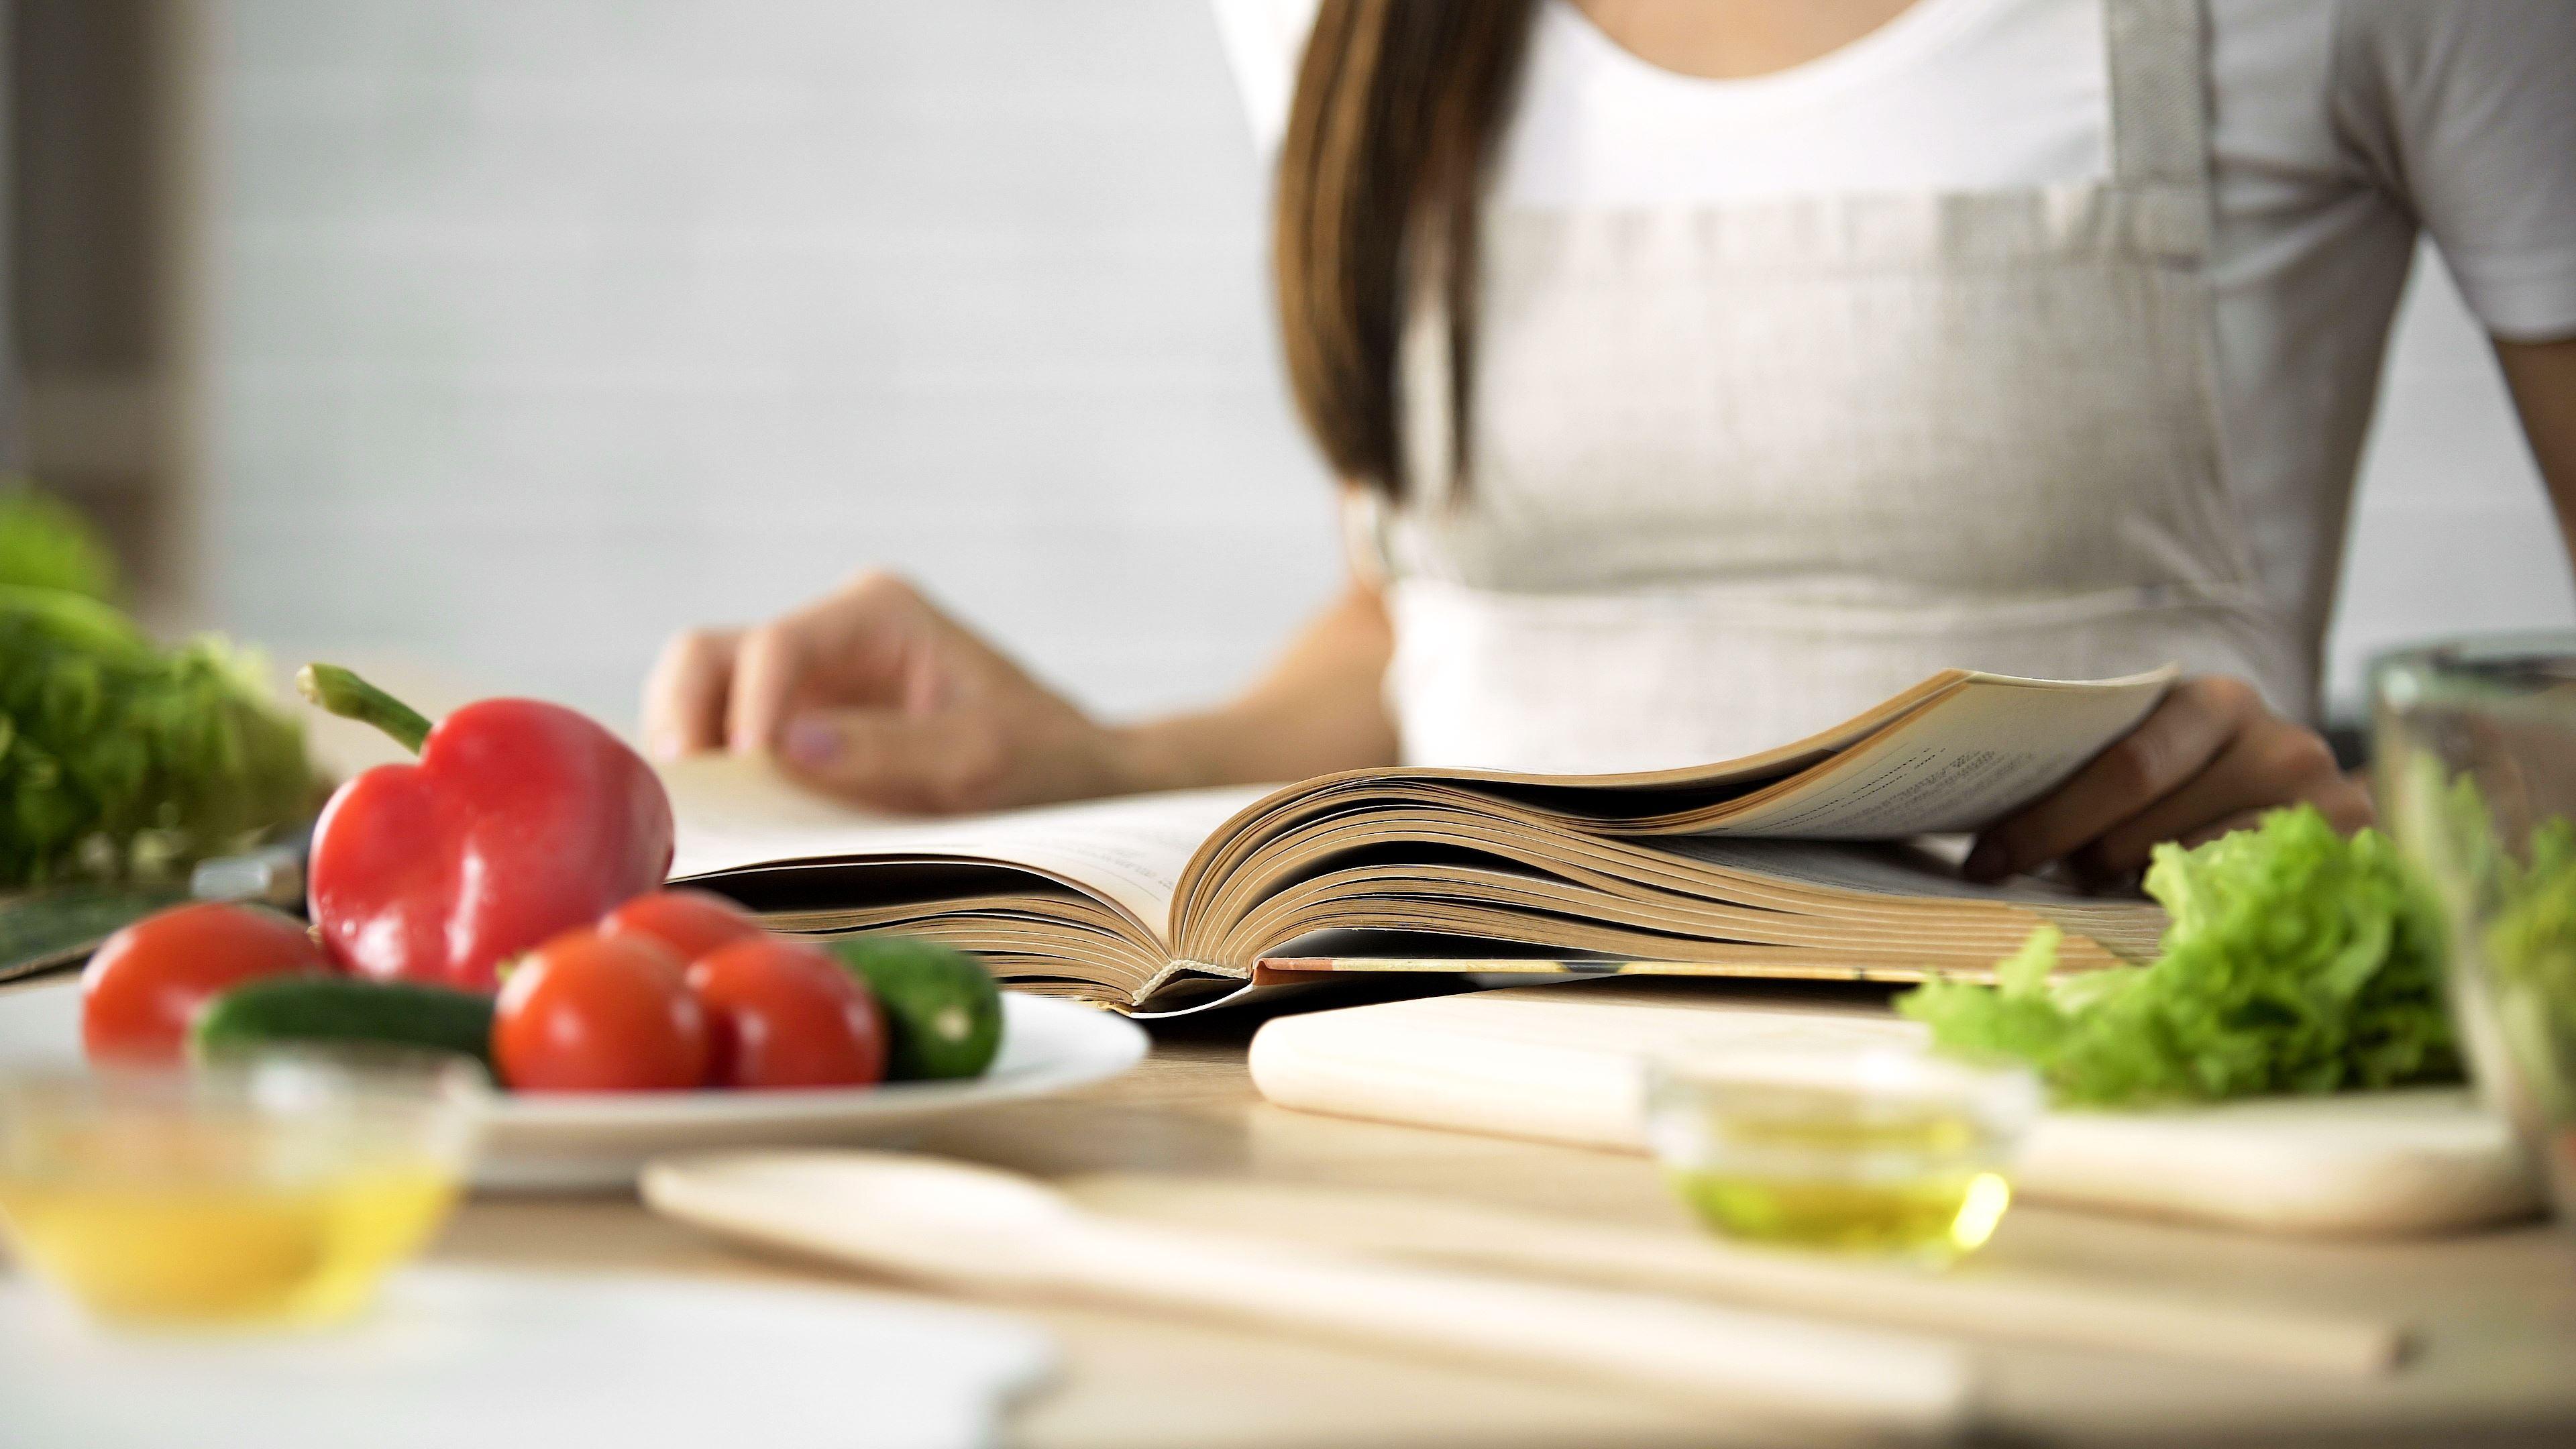 Os livros que te levam a saborear os quatro cantos do mundo